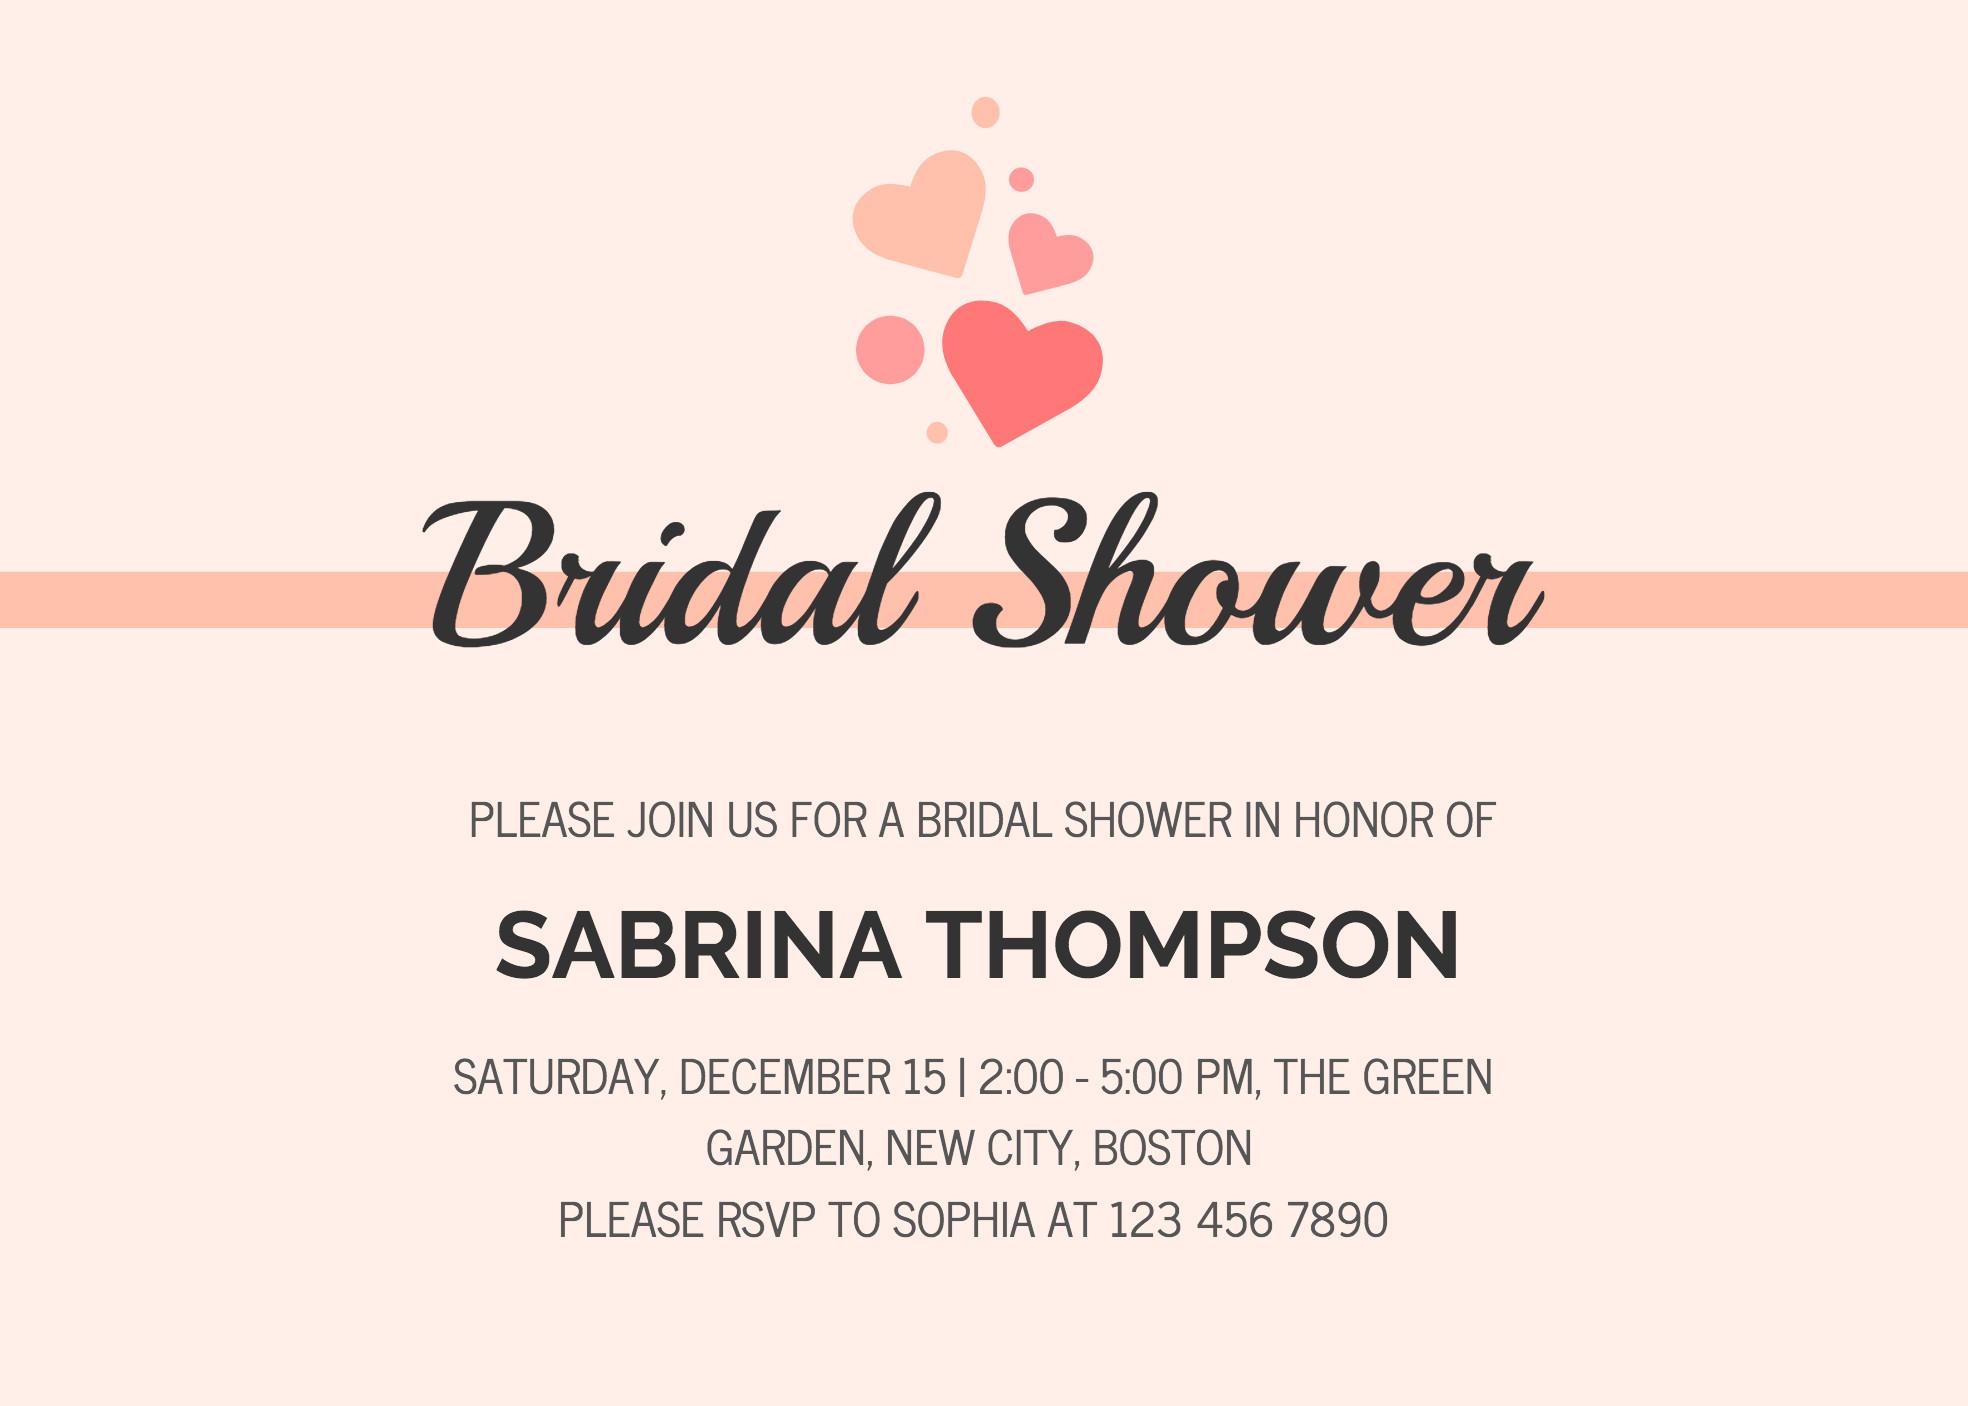 Wedding Shower Invite Templates 19 Diy Bridal Shower and Wedding Invitation Templates